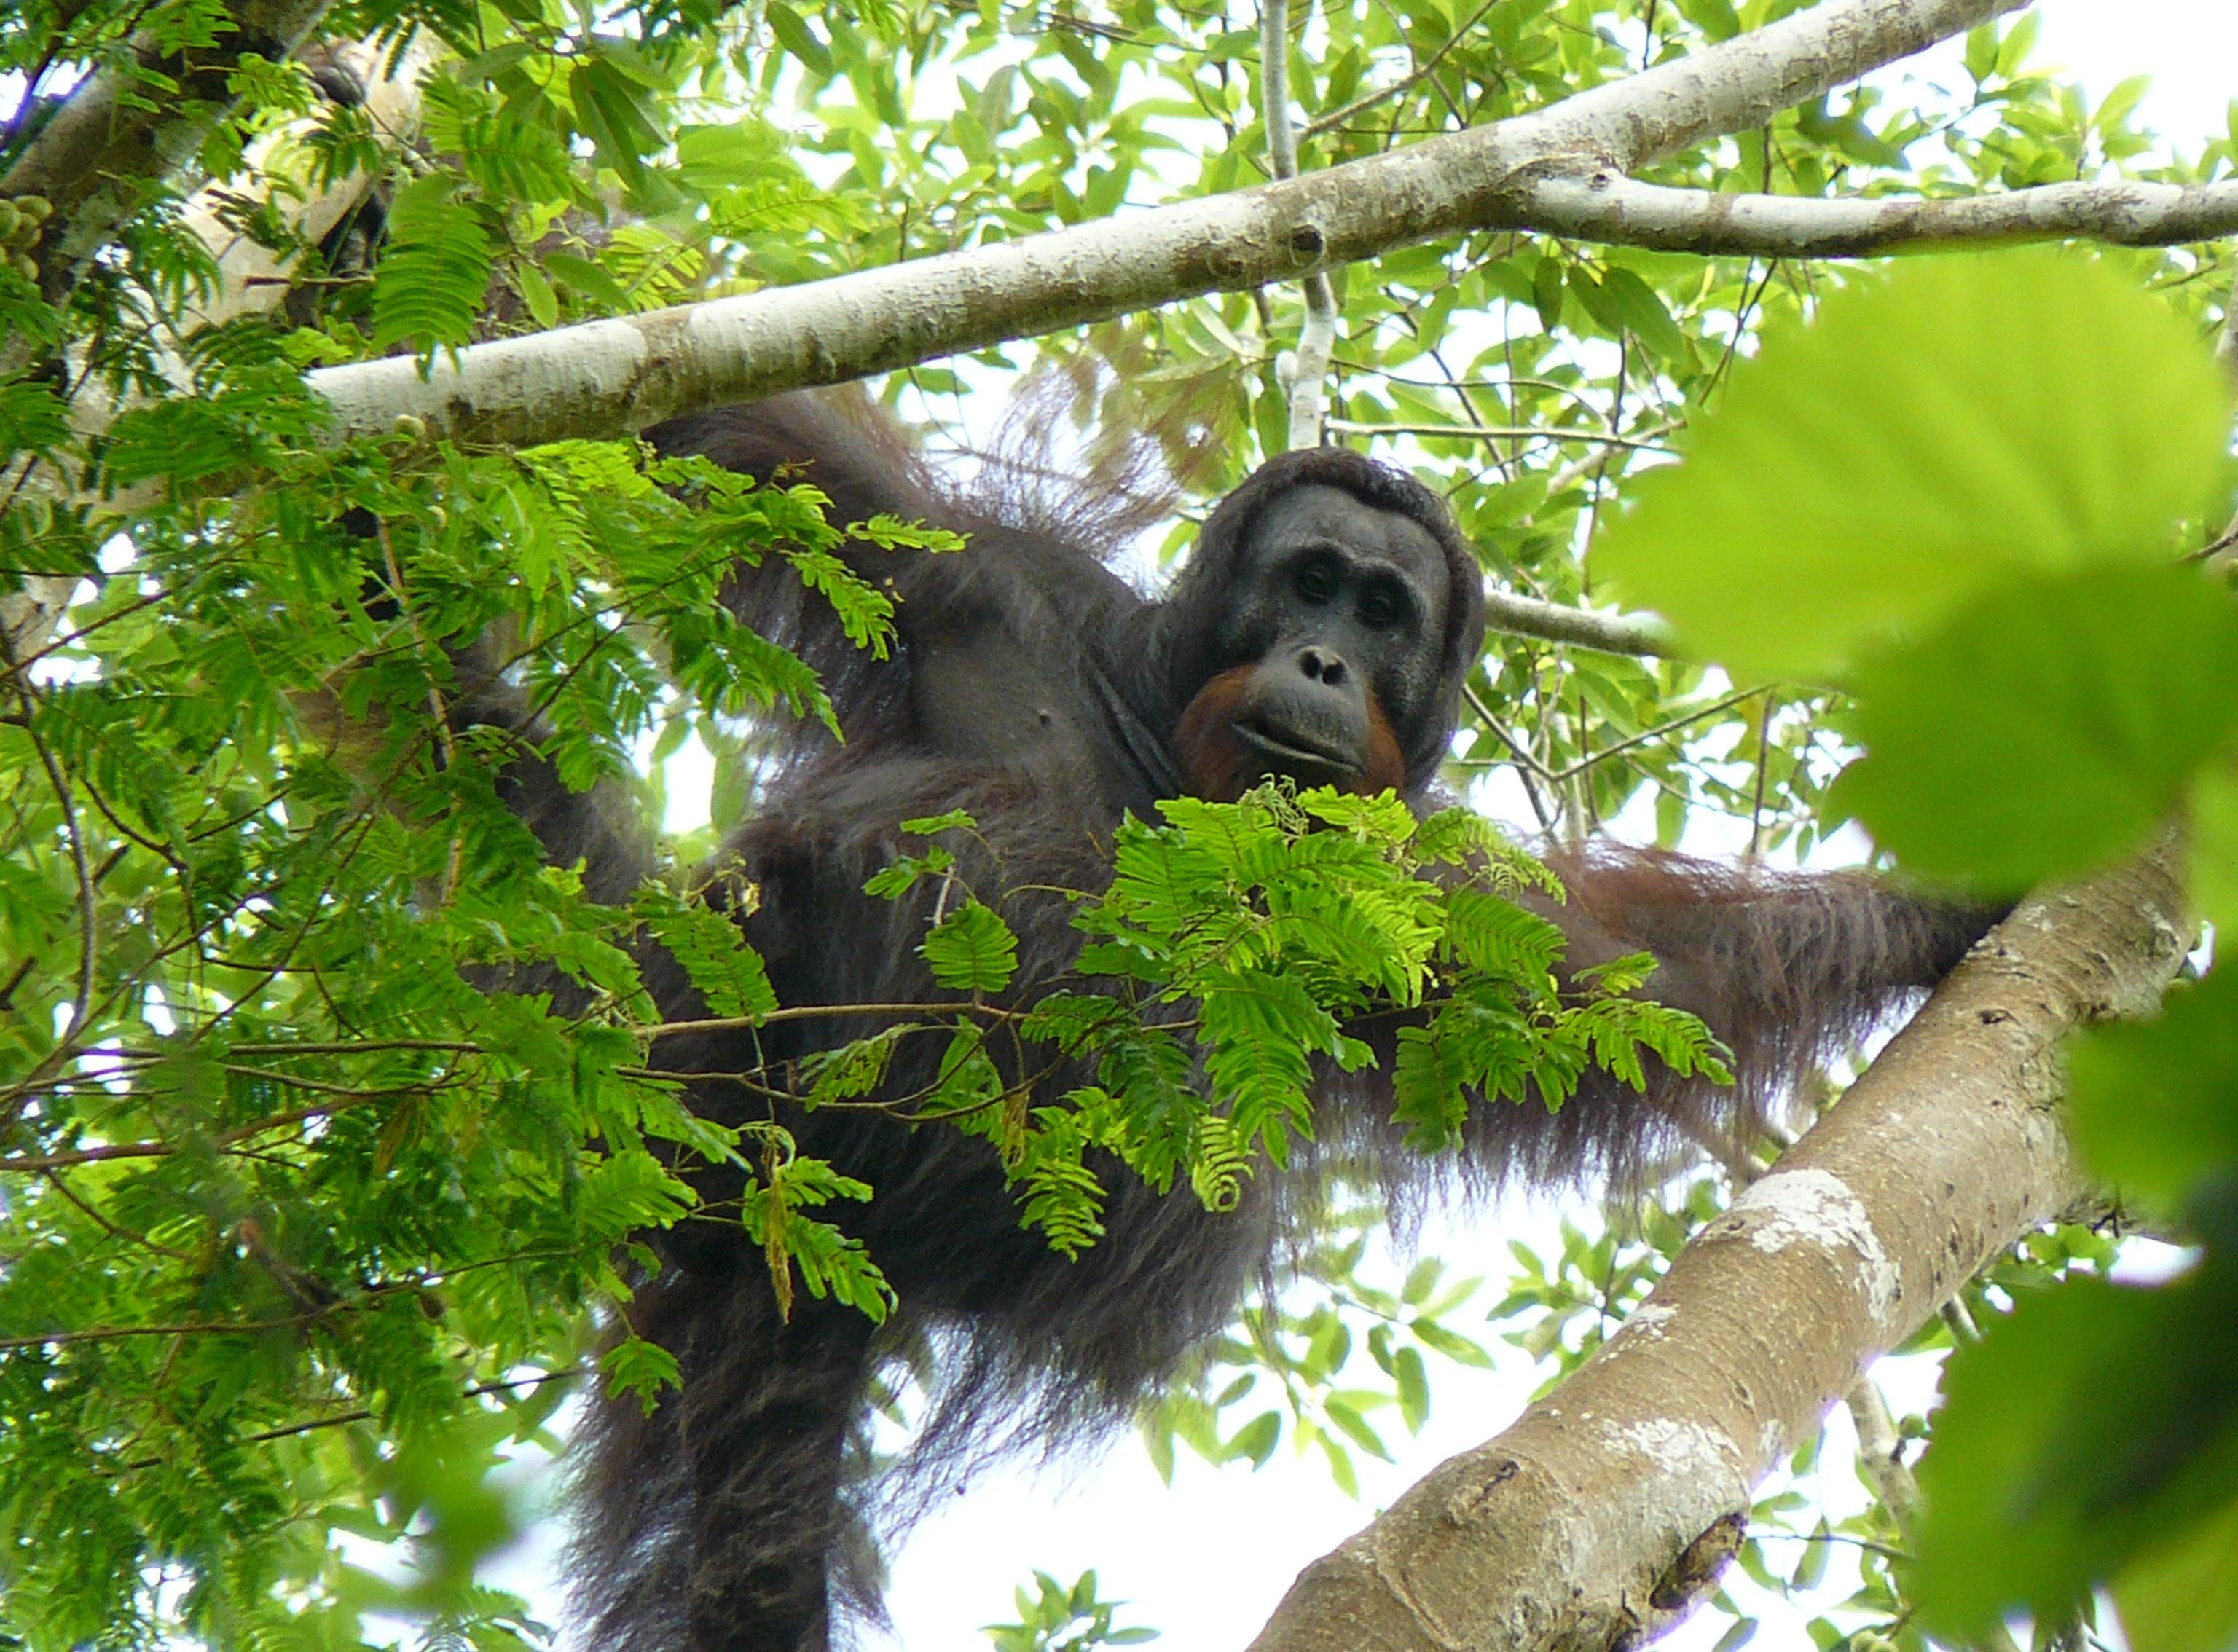 2013-08-19-OrangutanNardiyono.jpg